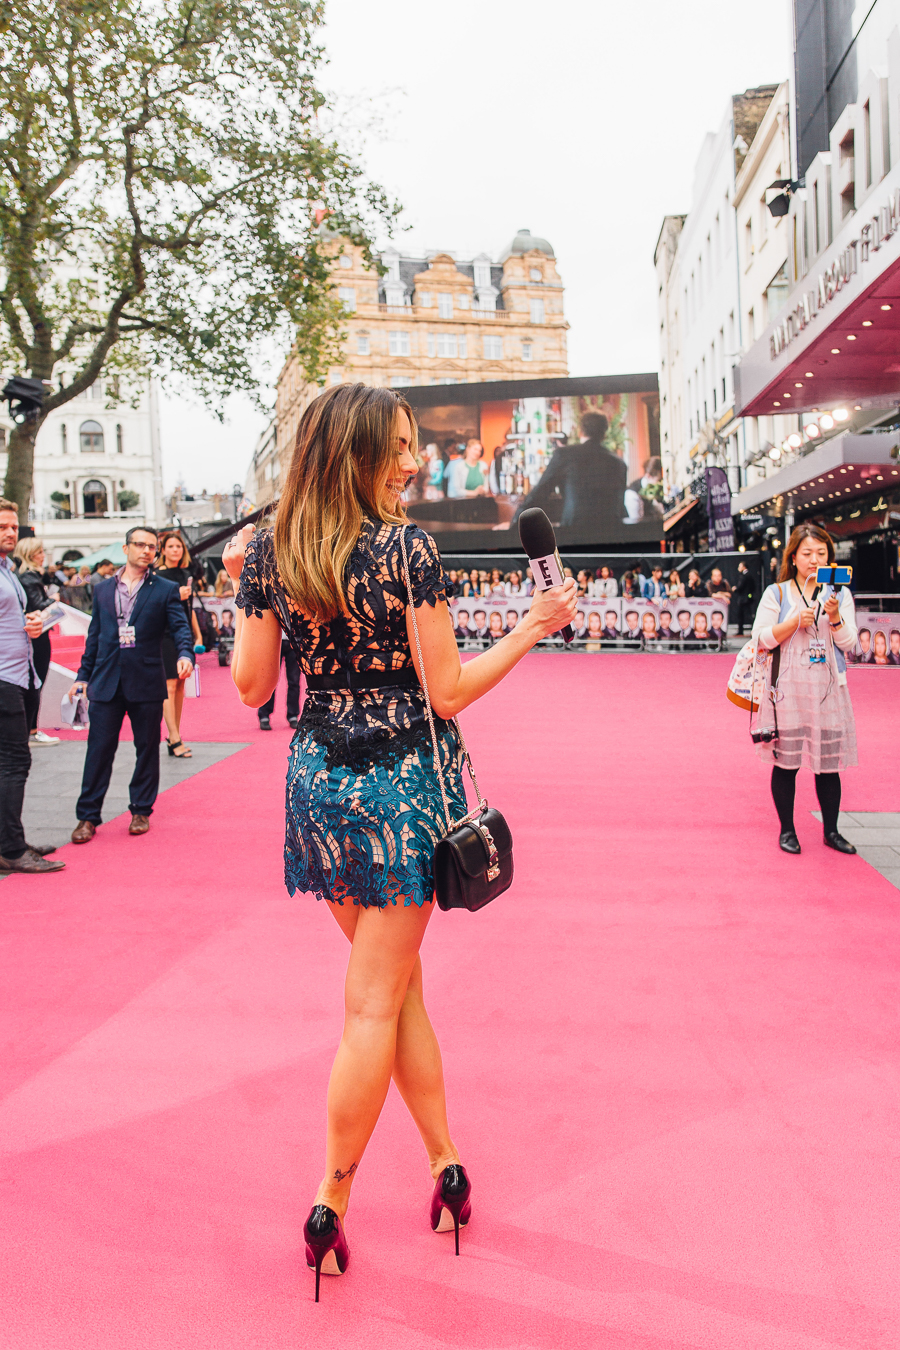 Sabrina Chakici E! UK Ireland - Bridget Jones Baby world premiere - clutch and carry on blog - E! Host UK & Ireland_-18